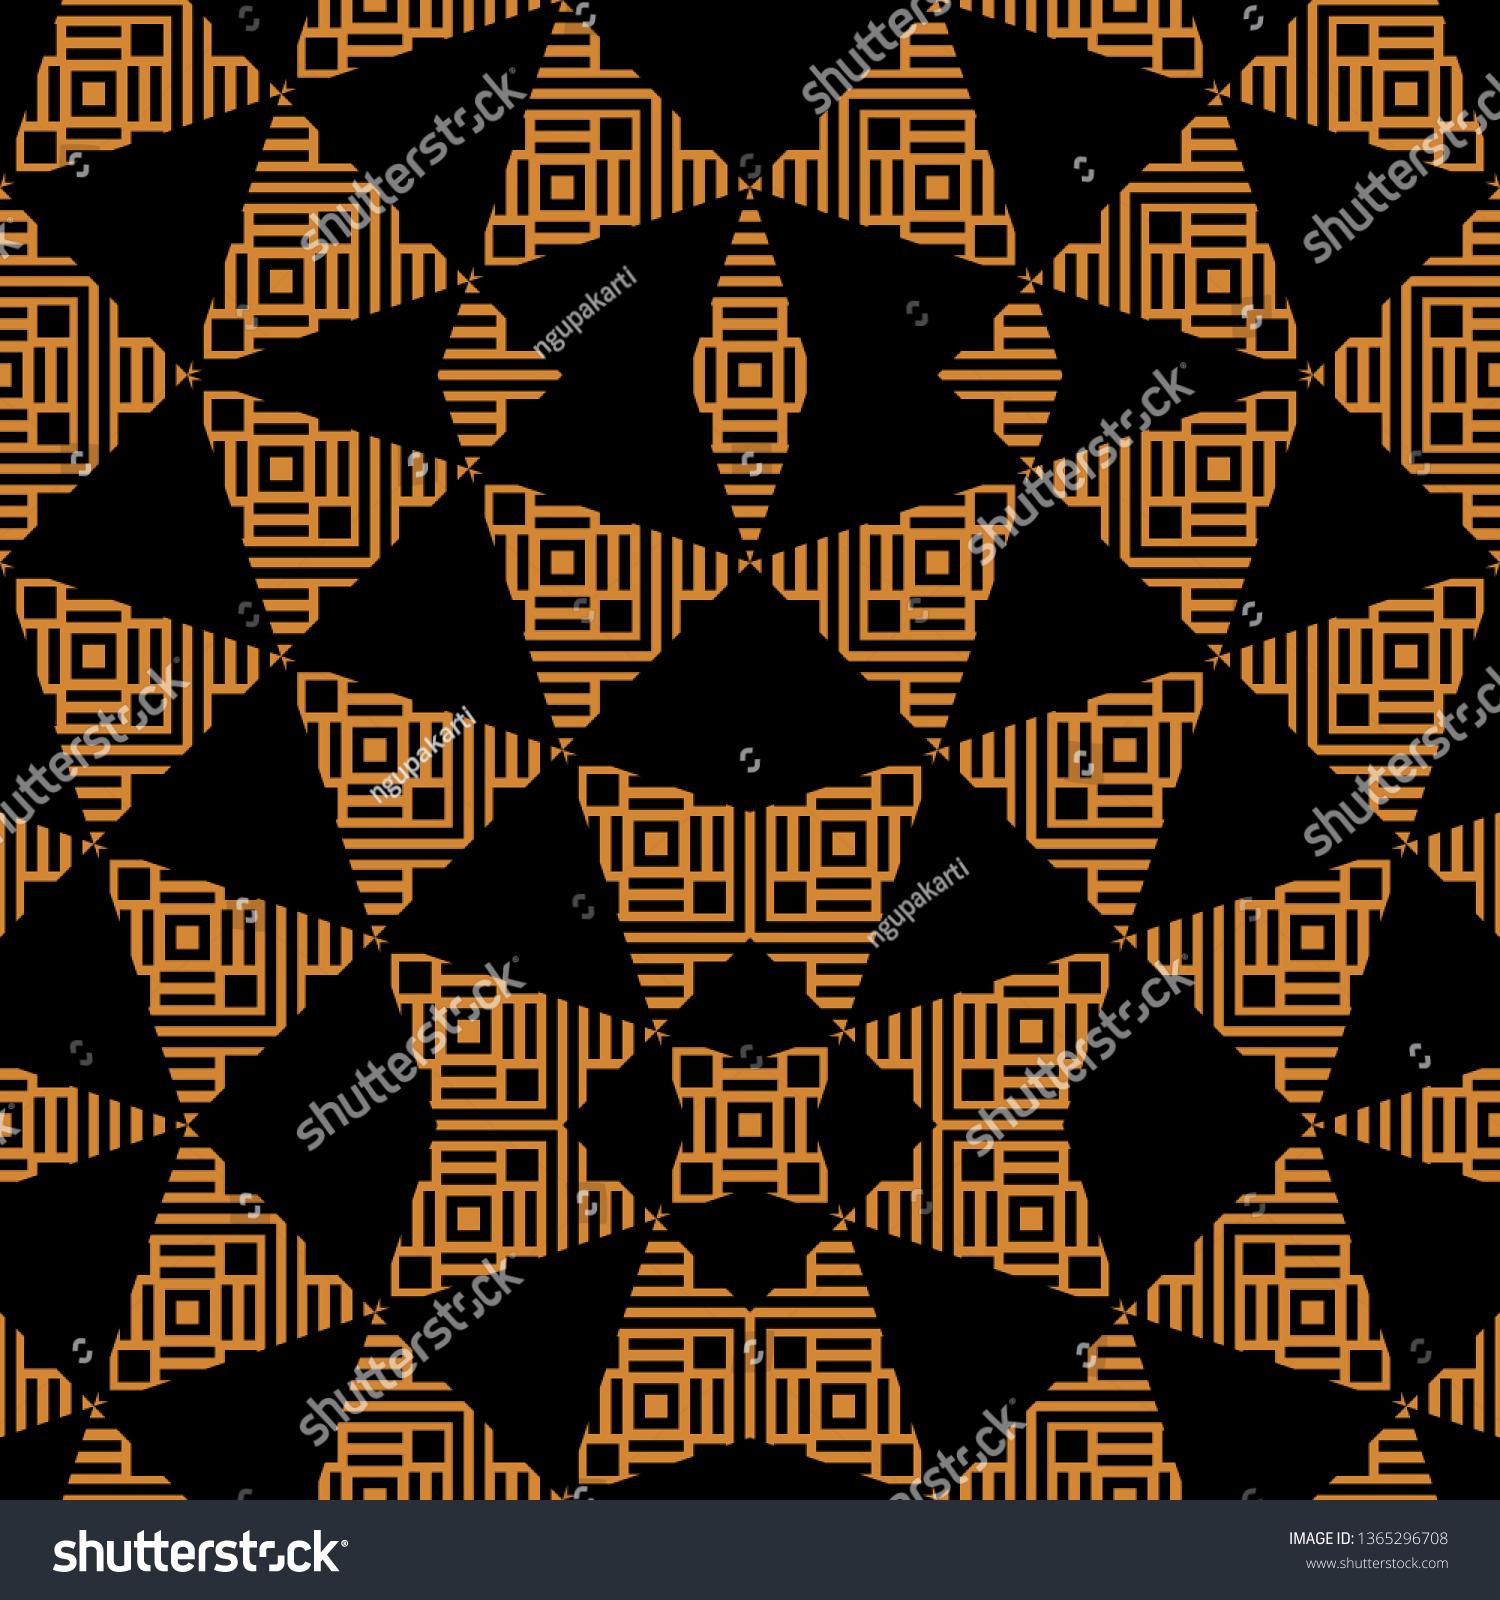 stock vector black orange art deco ornament ready for print and wallpaper 1365296708